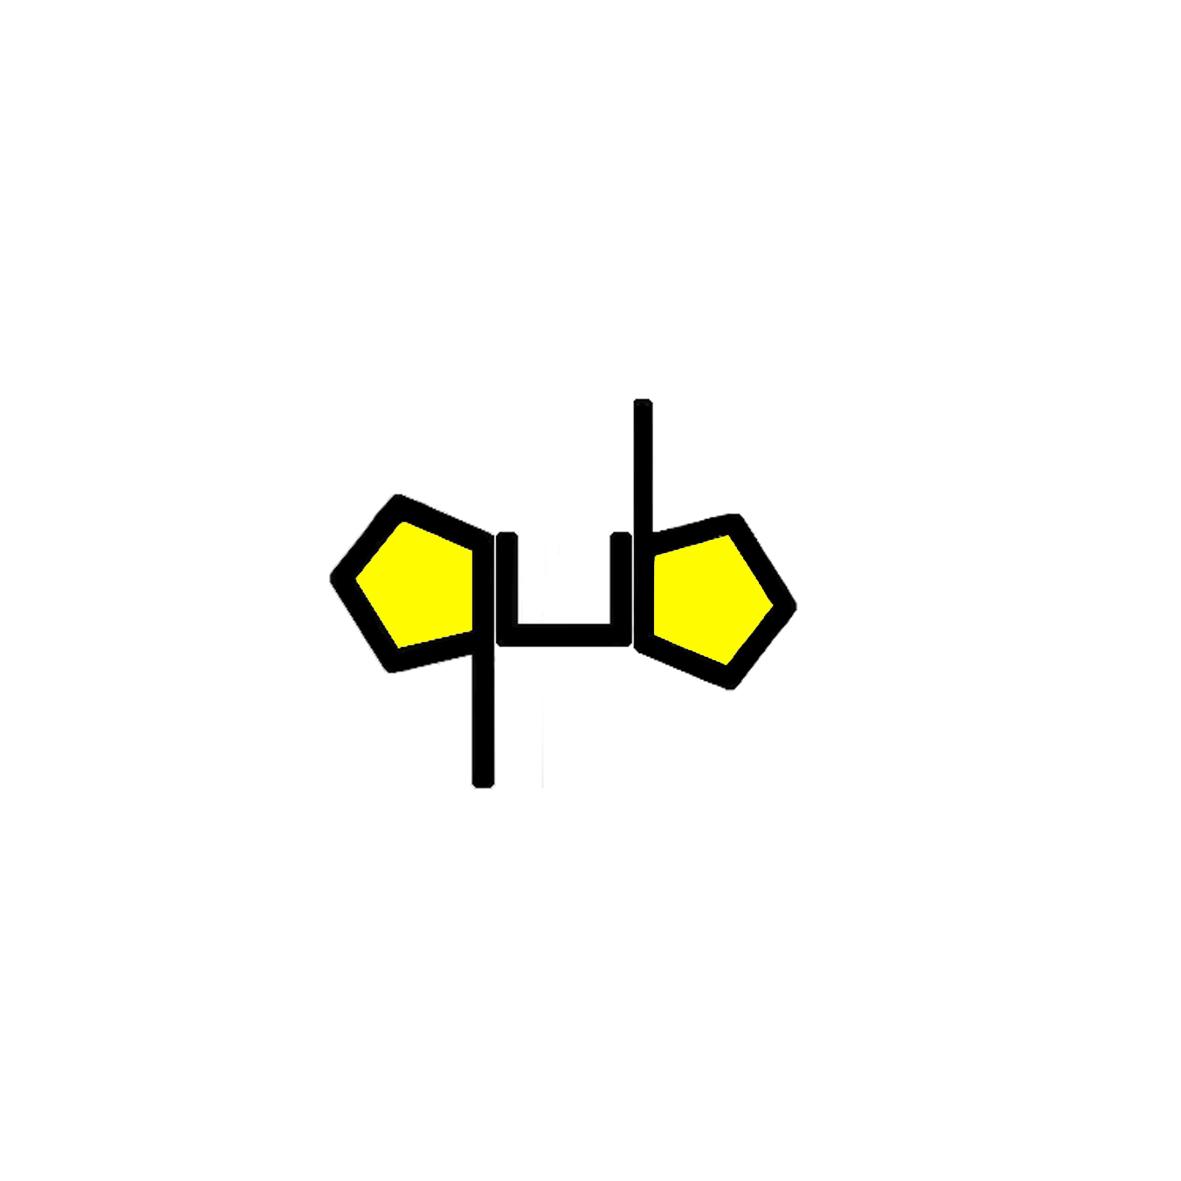 Разработка логотипа и фирменного стиля для ТМ фото f_1645f1c82c33b4cb.jpg